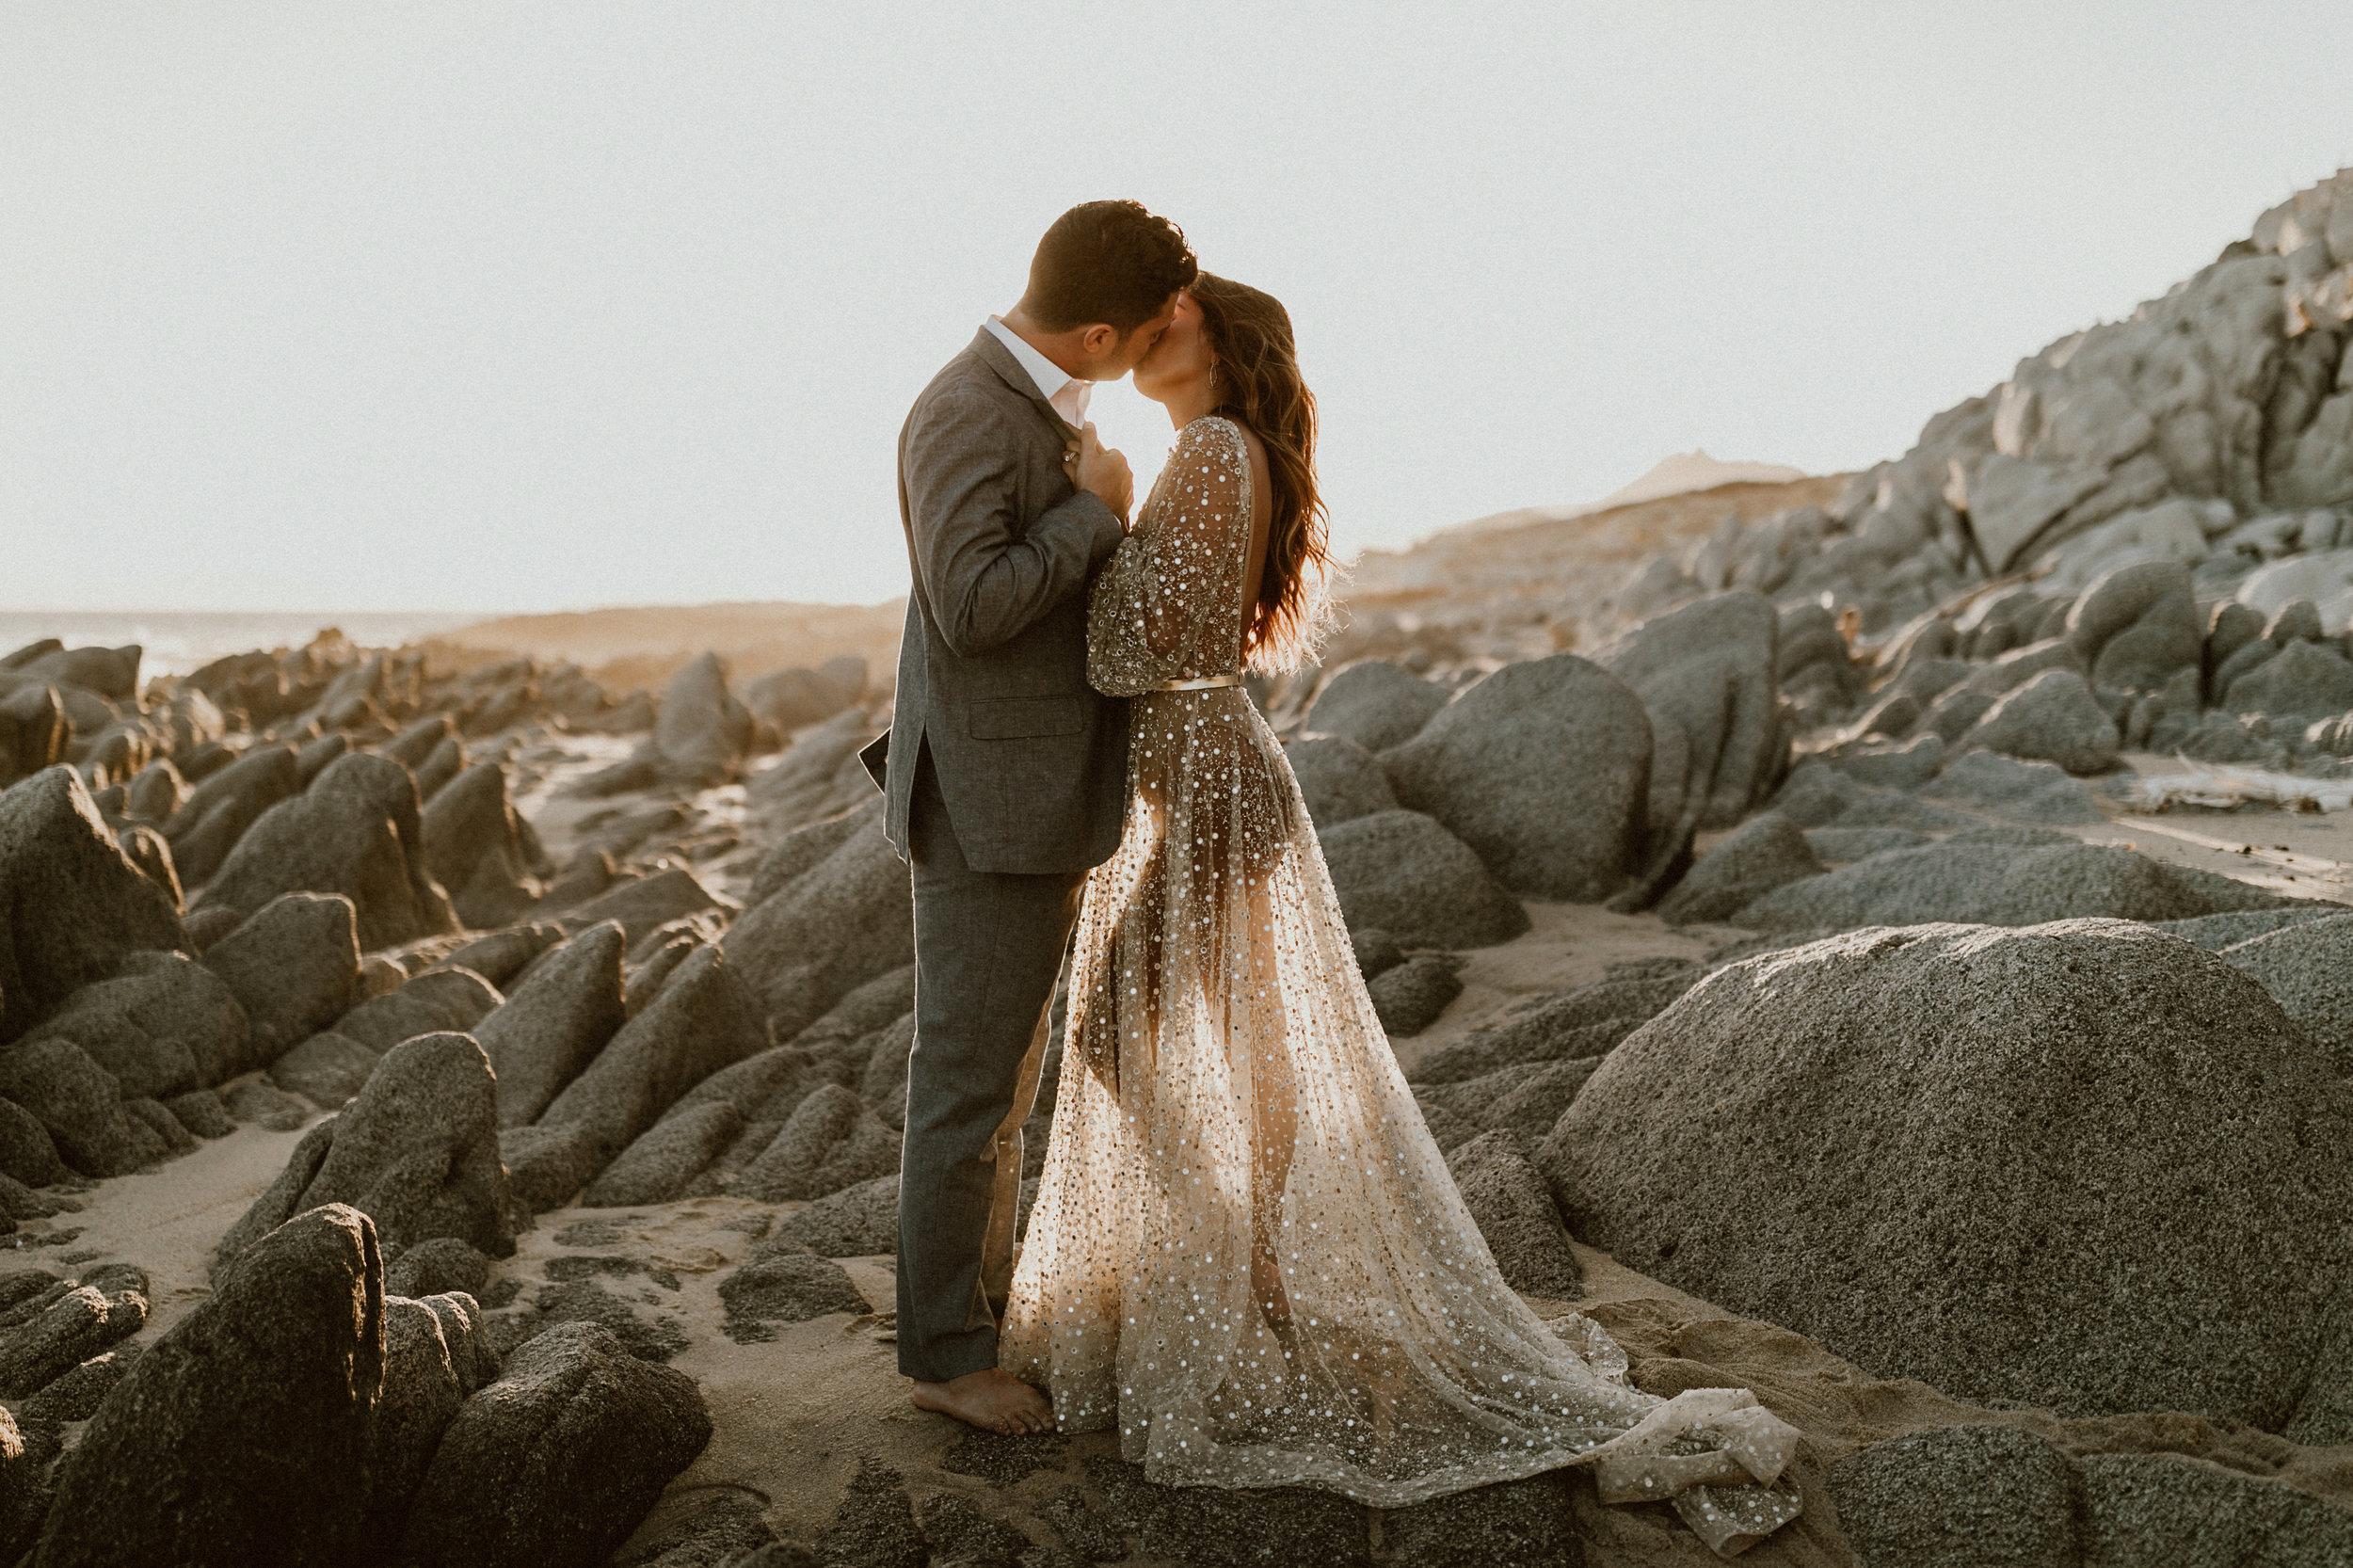 Glamorous Beach Photoshoot - Los Cabos, Mexico   Gina + Ryan Photography